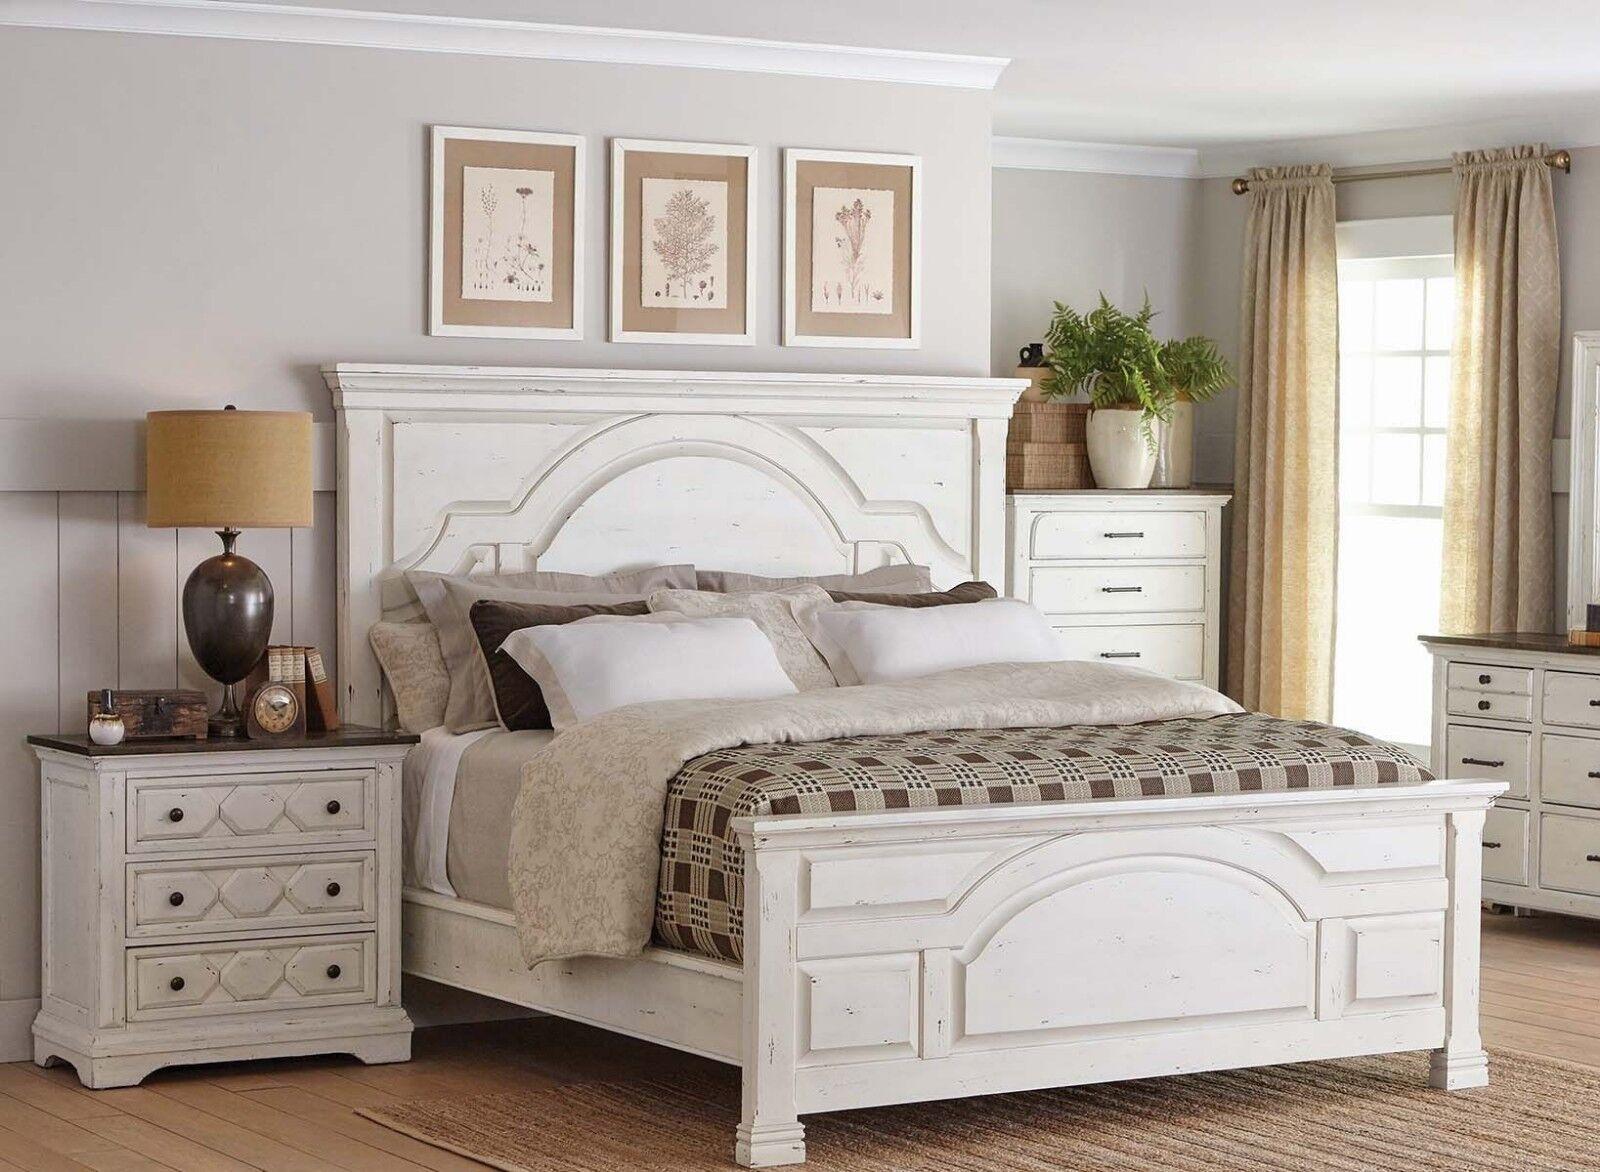 Rustic 4 Pc White Wood Queen Bed Nightstand Dresser Mirror Bedroom Furniture Set For Sale Online